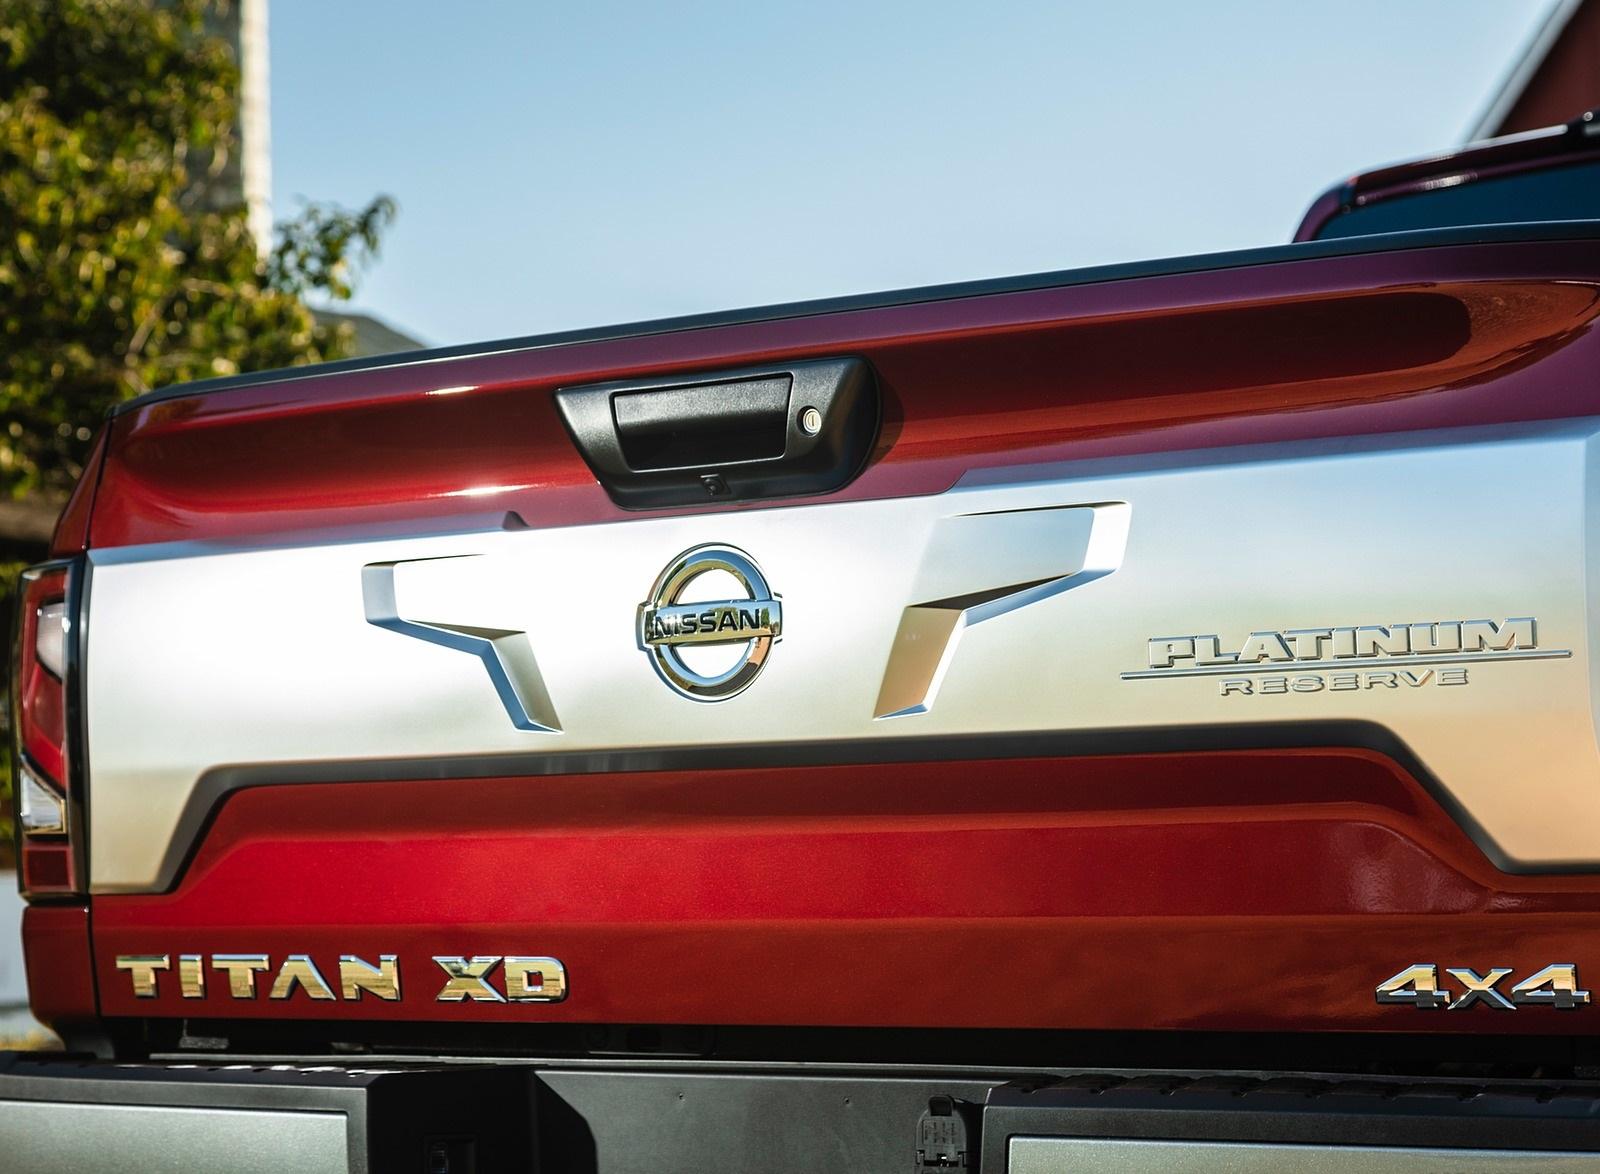 2020 Nissan TITAN XD Platinum Reserve Detail Wallpapers (7)